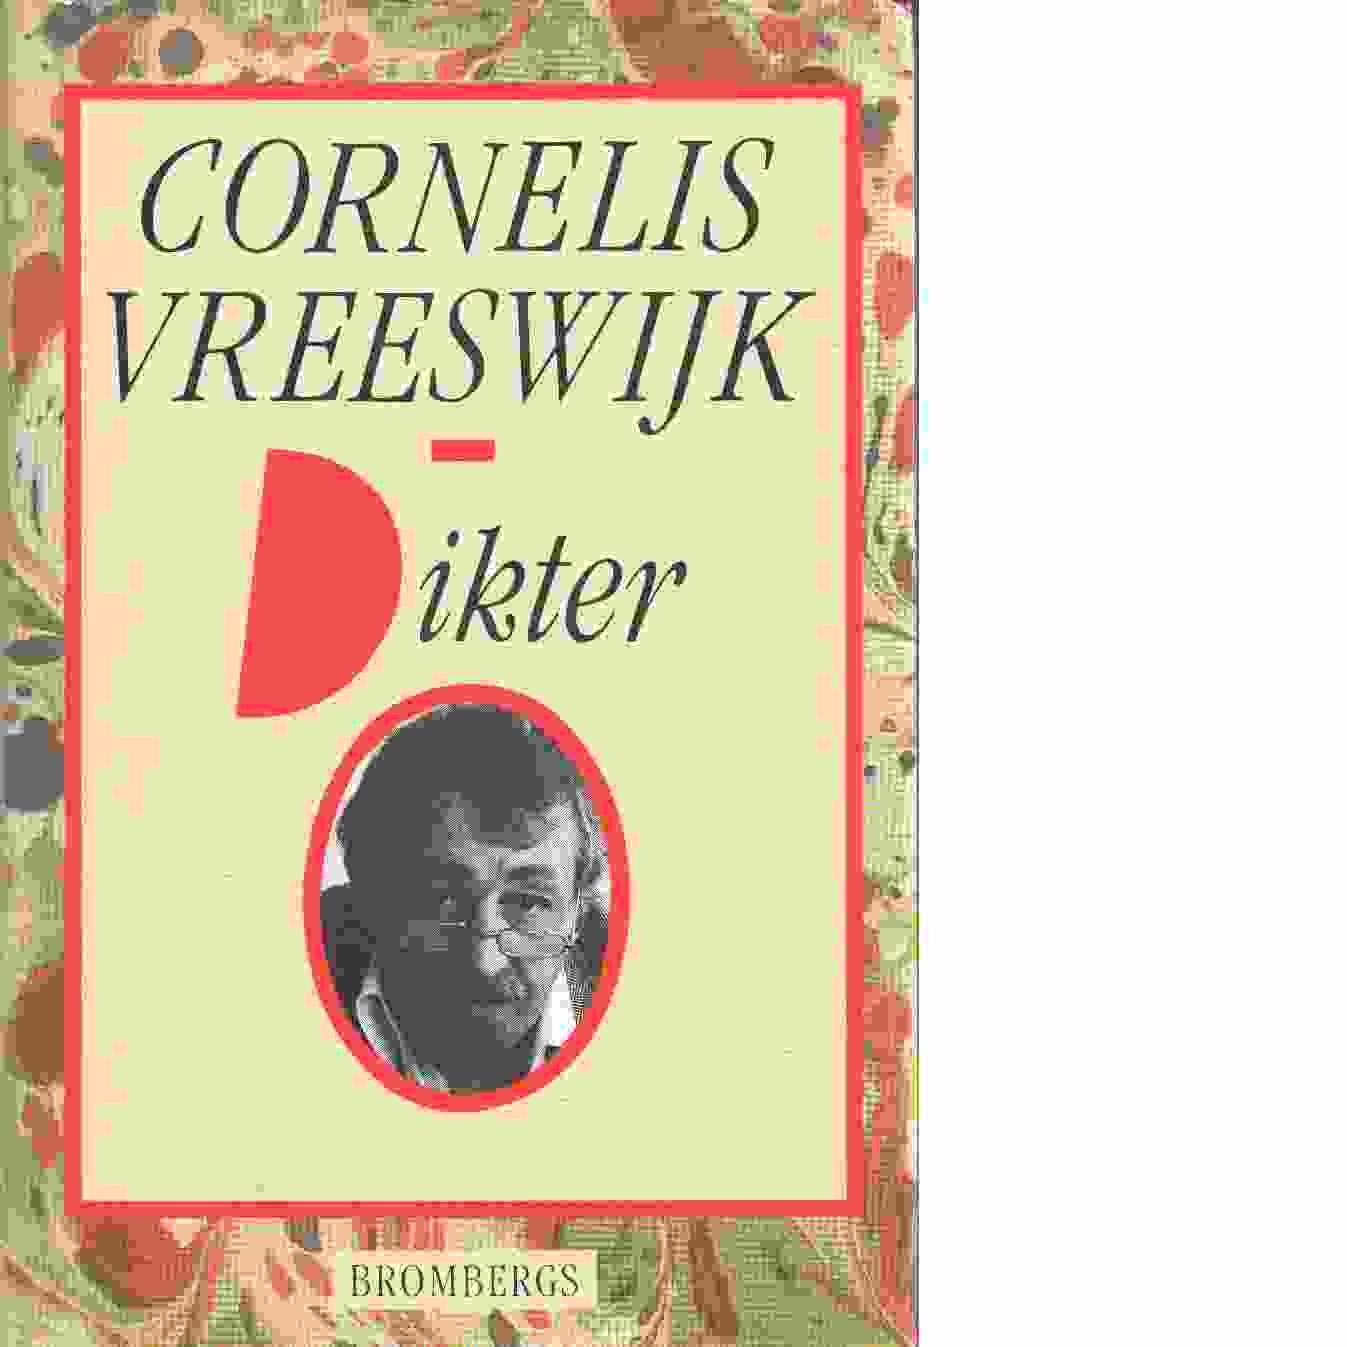 Dikter - Vreeswijk, Cornelis